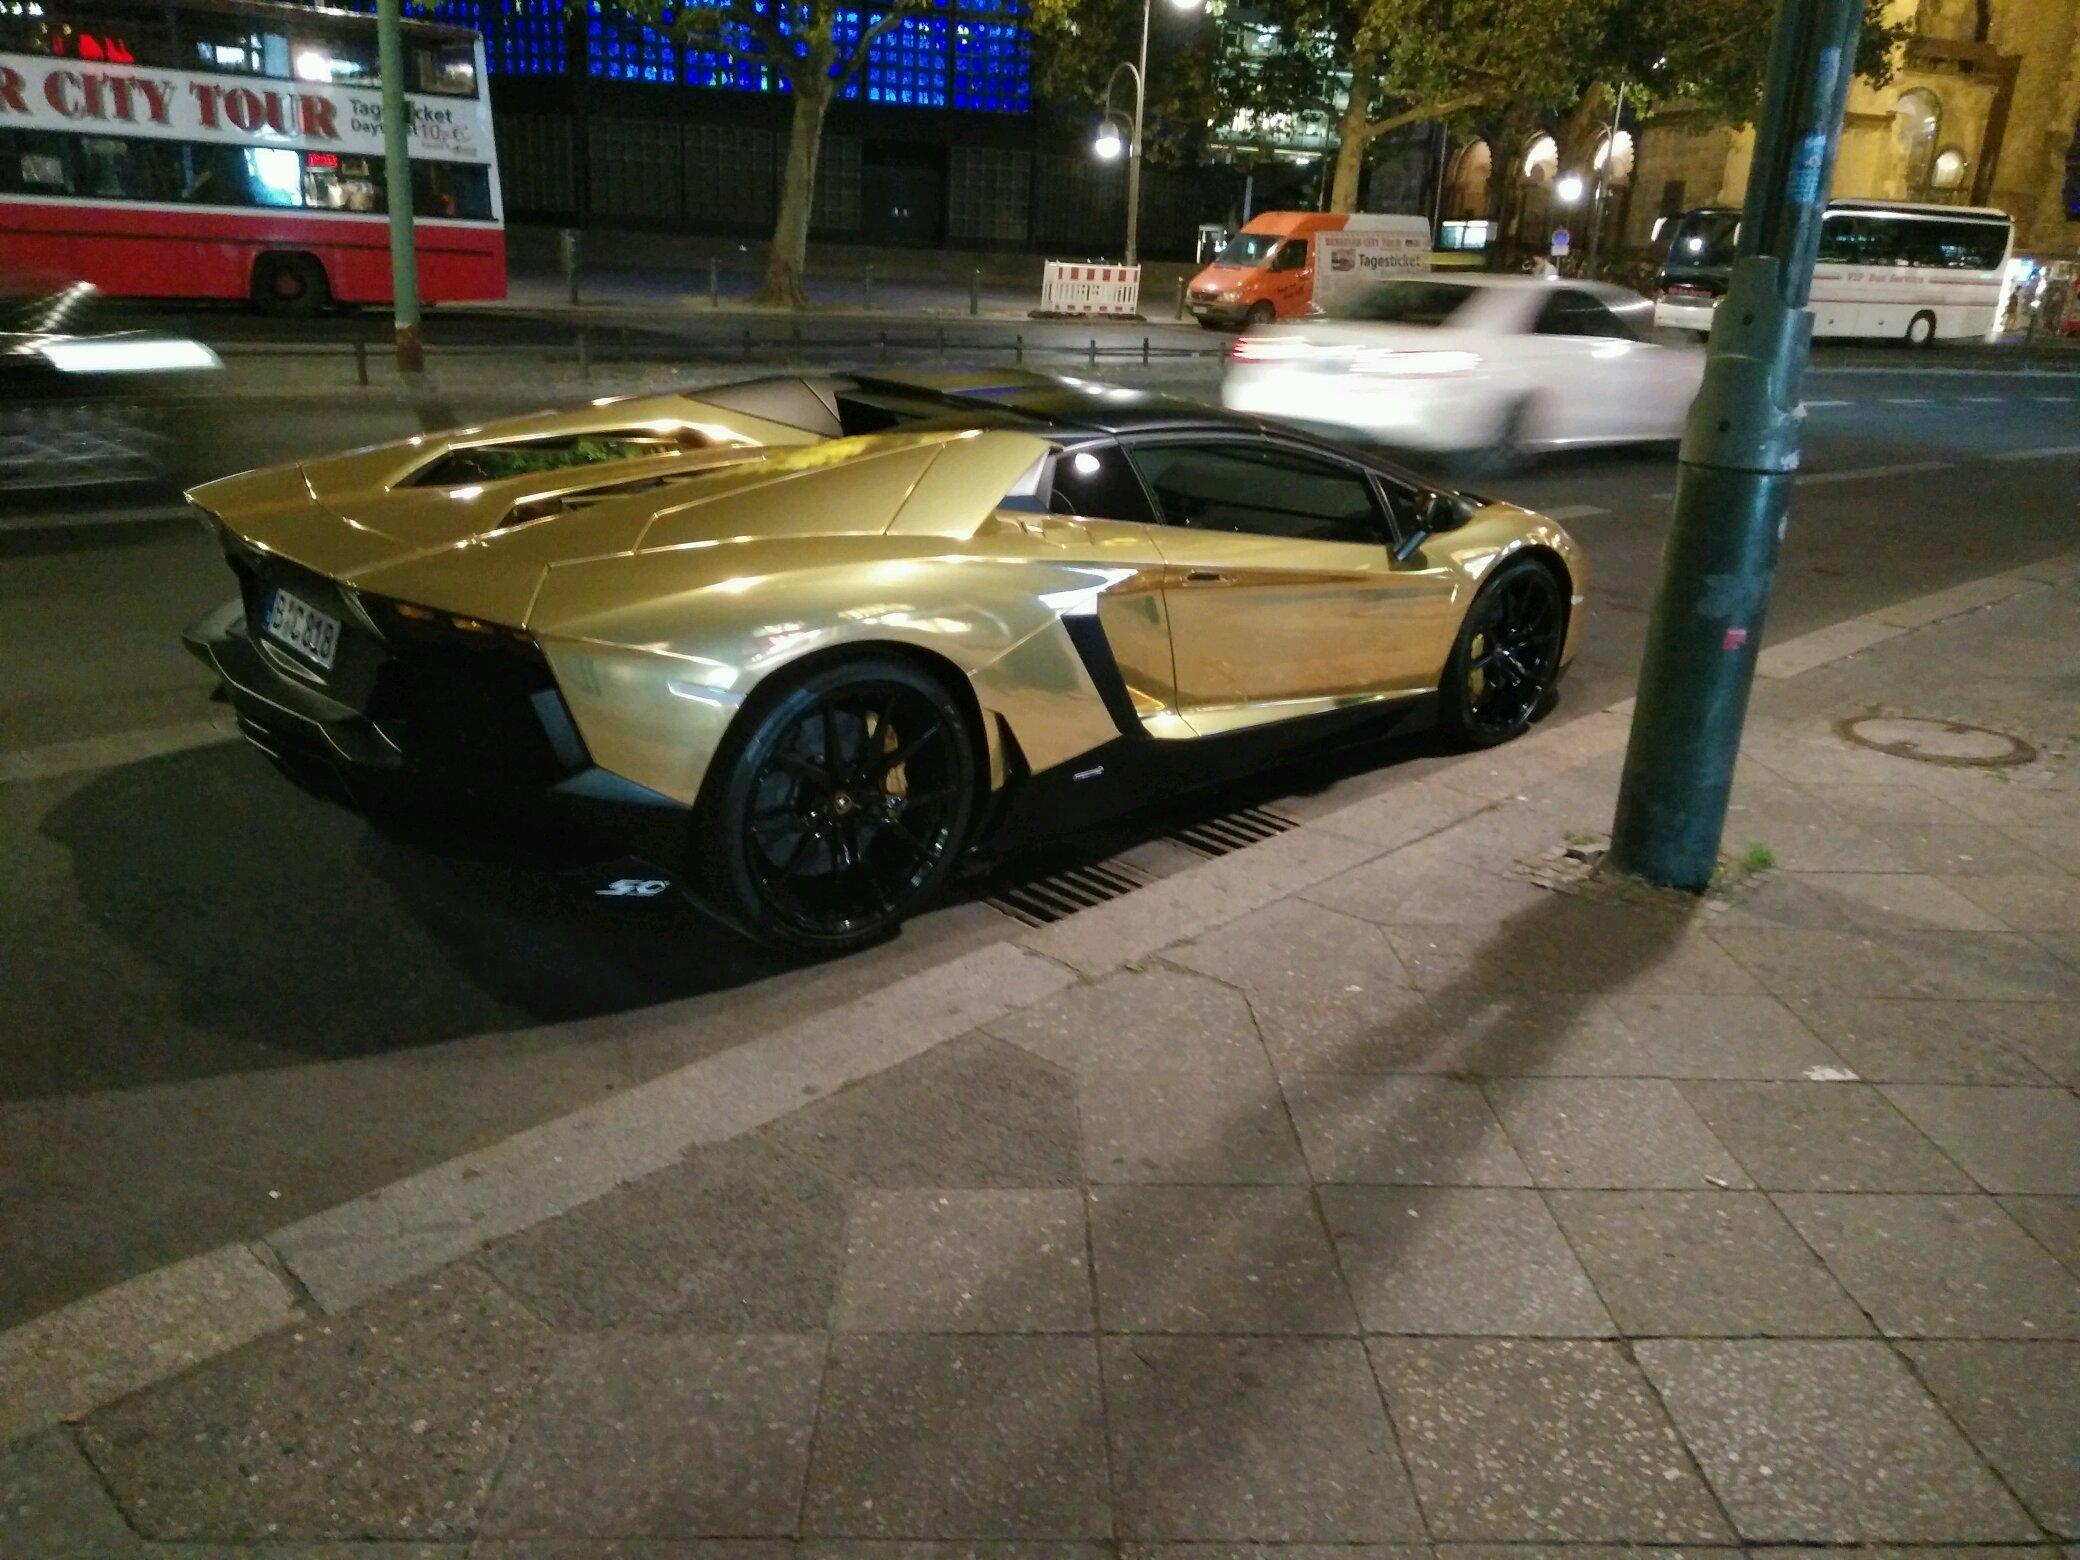 Chrome Gold Aventador Roadster in Berlin on gold ford mustang convertible, gold bmw convertible, gold lamborghini veneno roadster, gold corvette convertible, gold audi convertible, gold ferrari convertible,